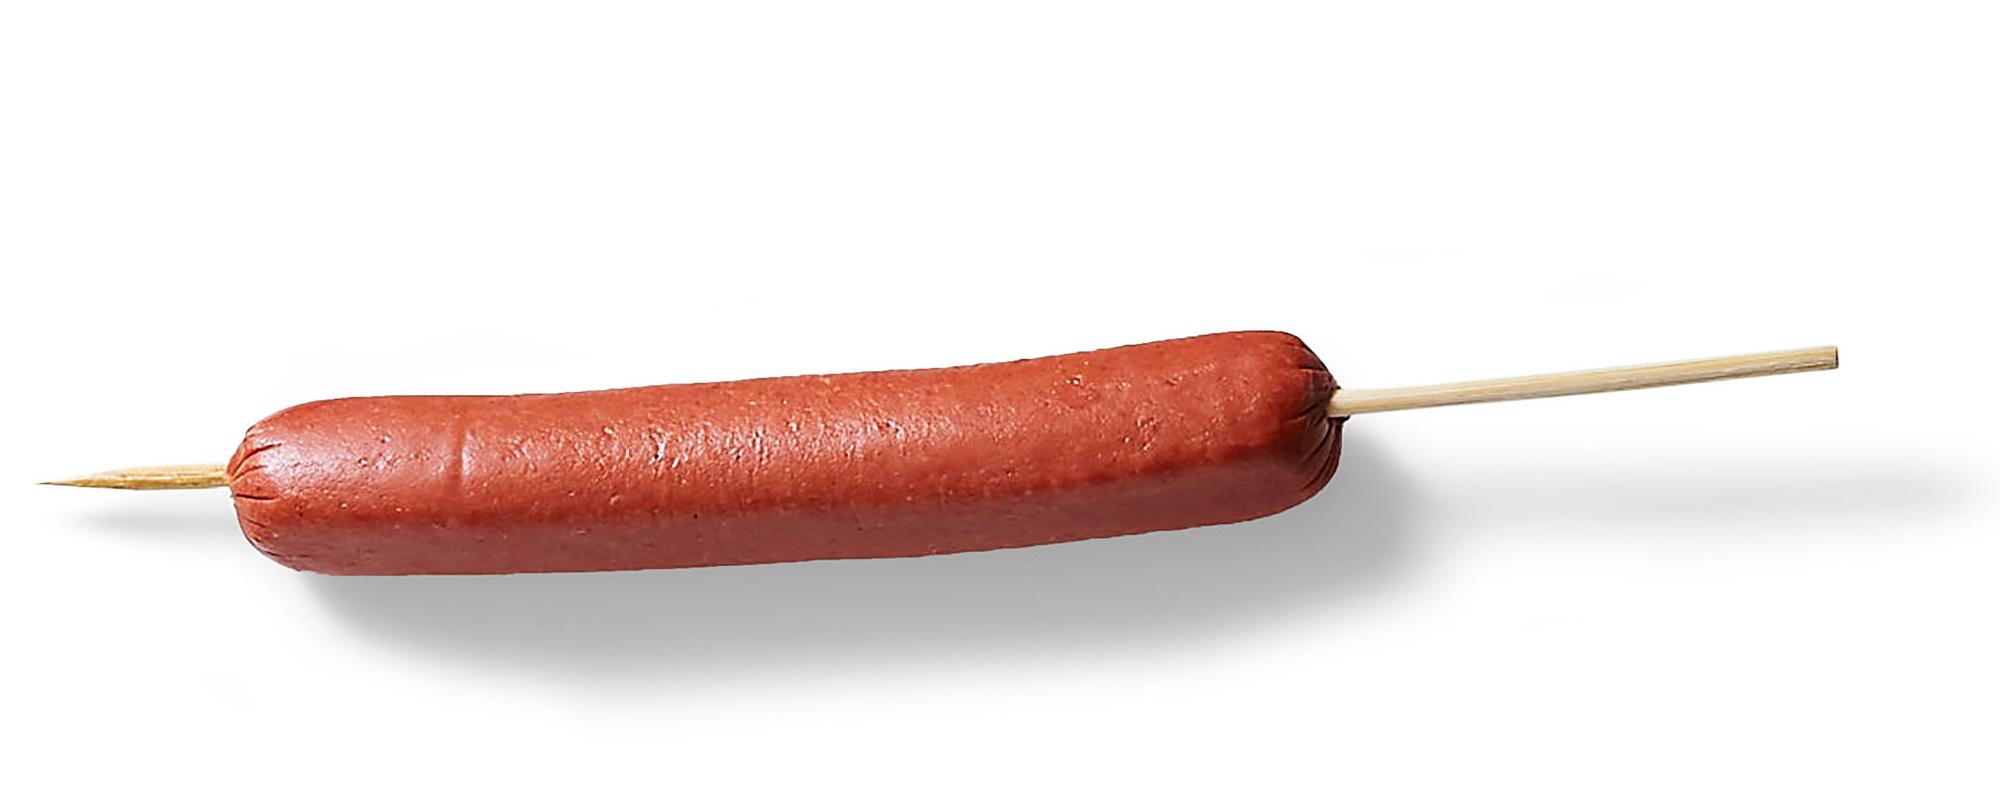 spiralized hotdog step one 0918